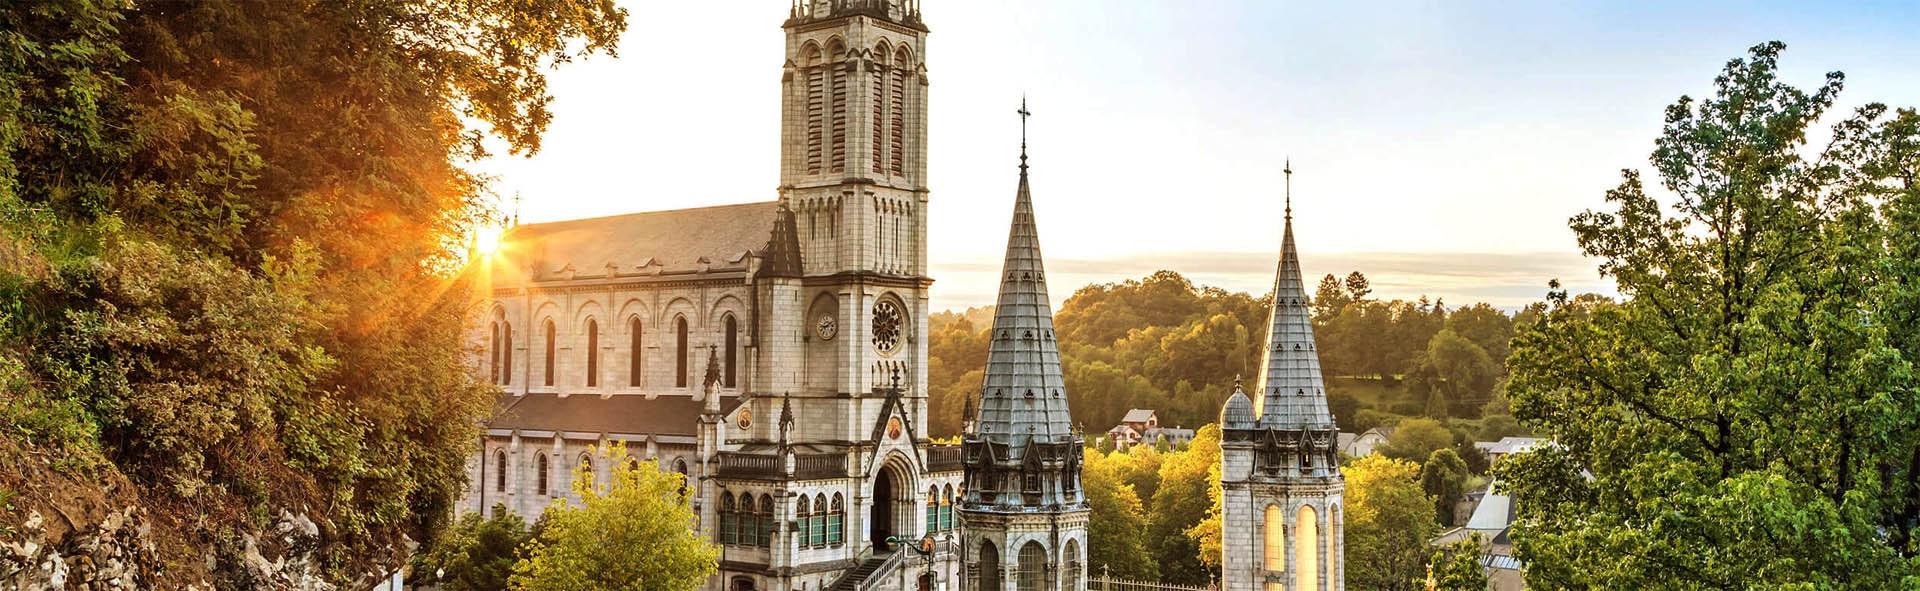 Pellegrinaggio a Lourdes in Pullman dal Nord Santi